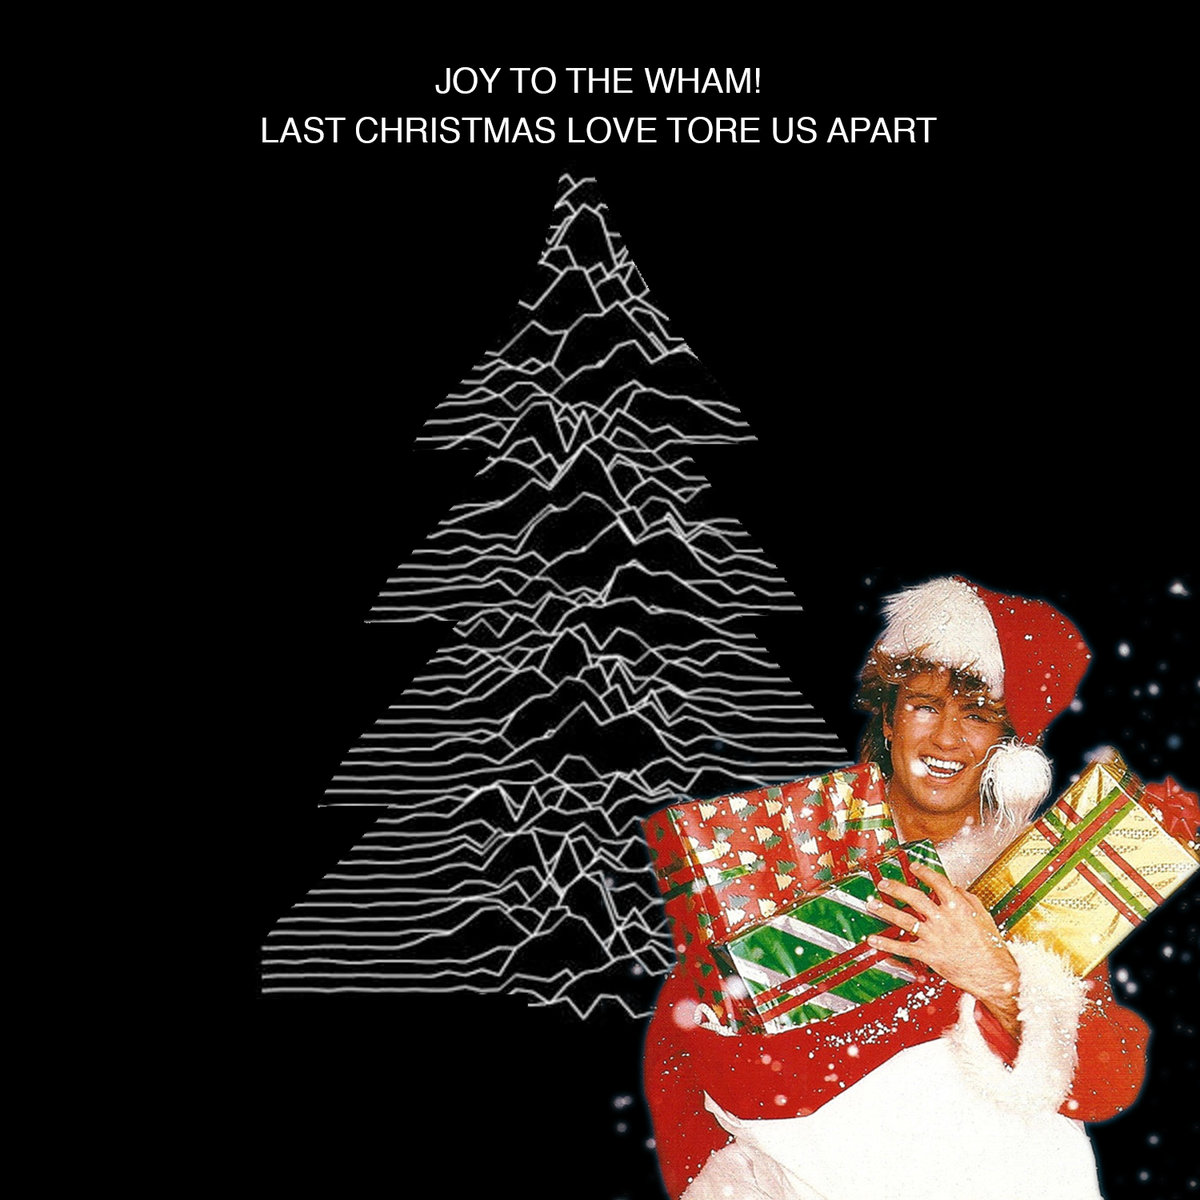 Wham Last Christmas.Joy To The Wham Last Christmas Love Tore Us Apart